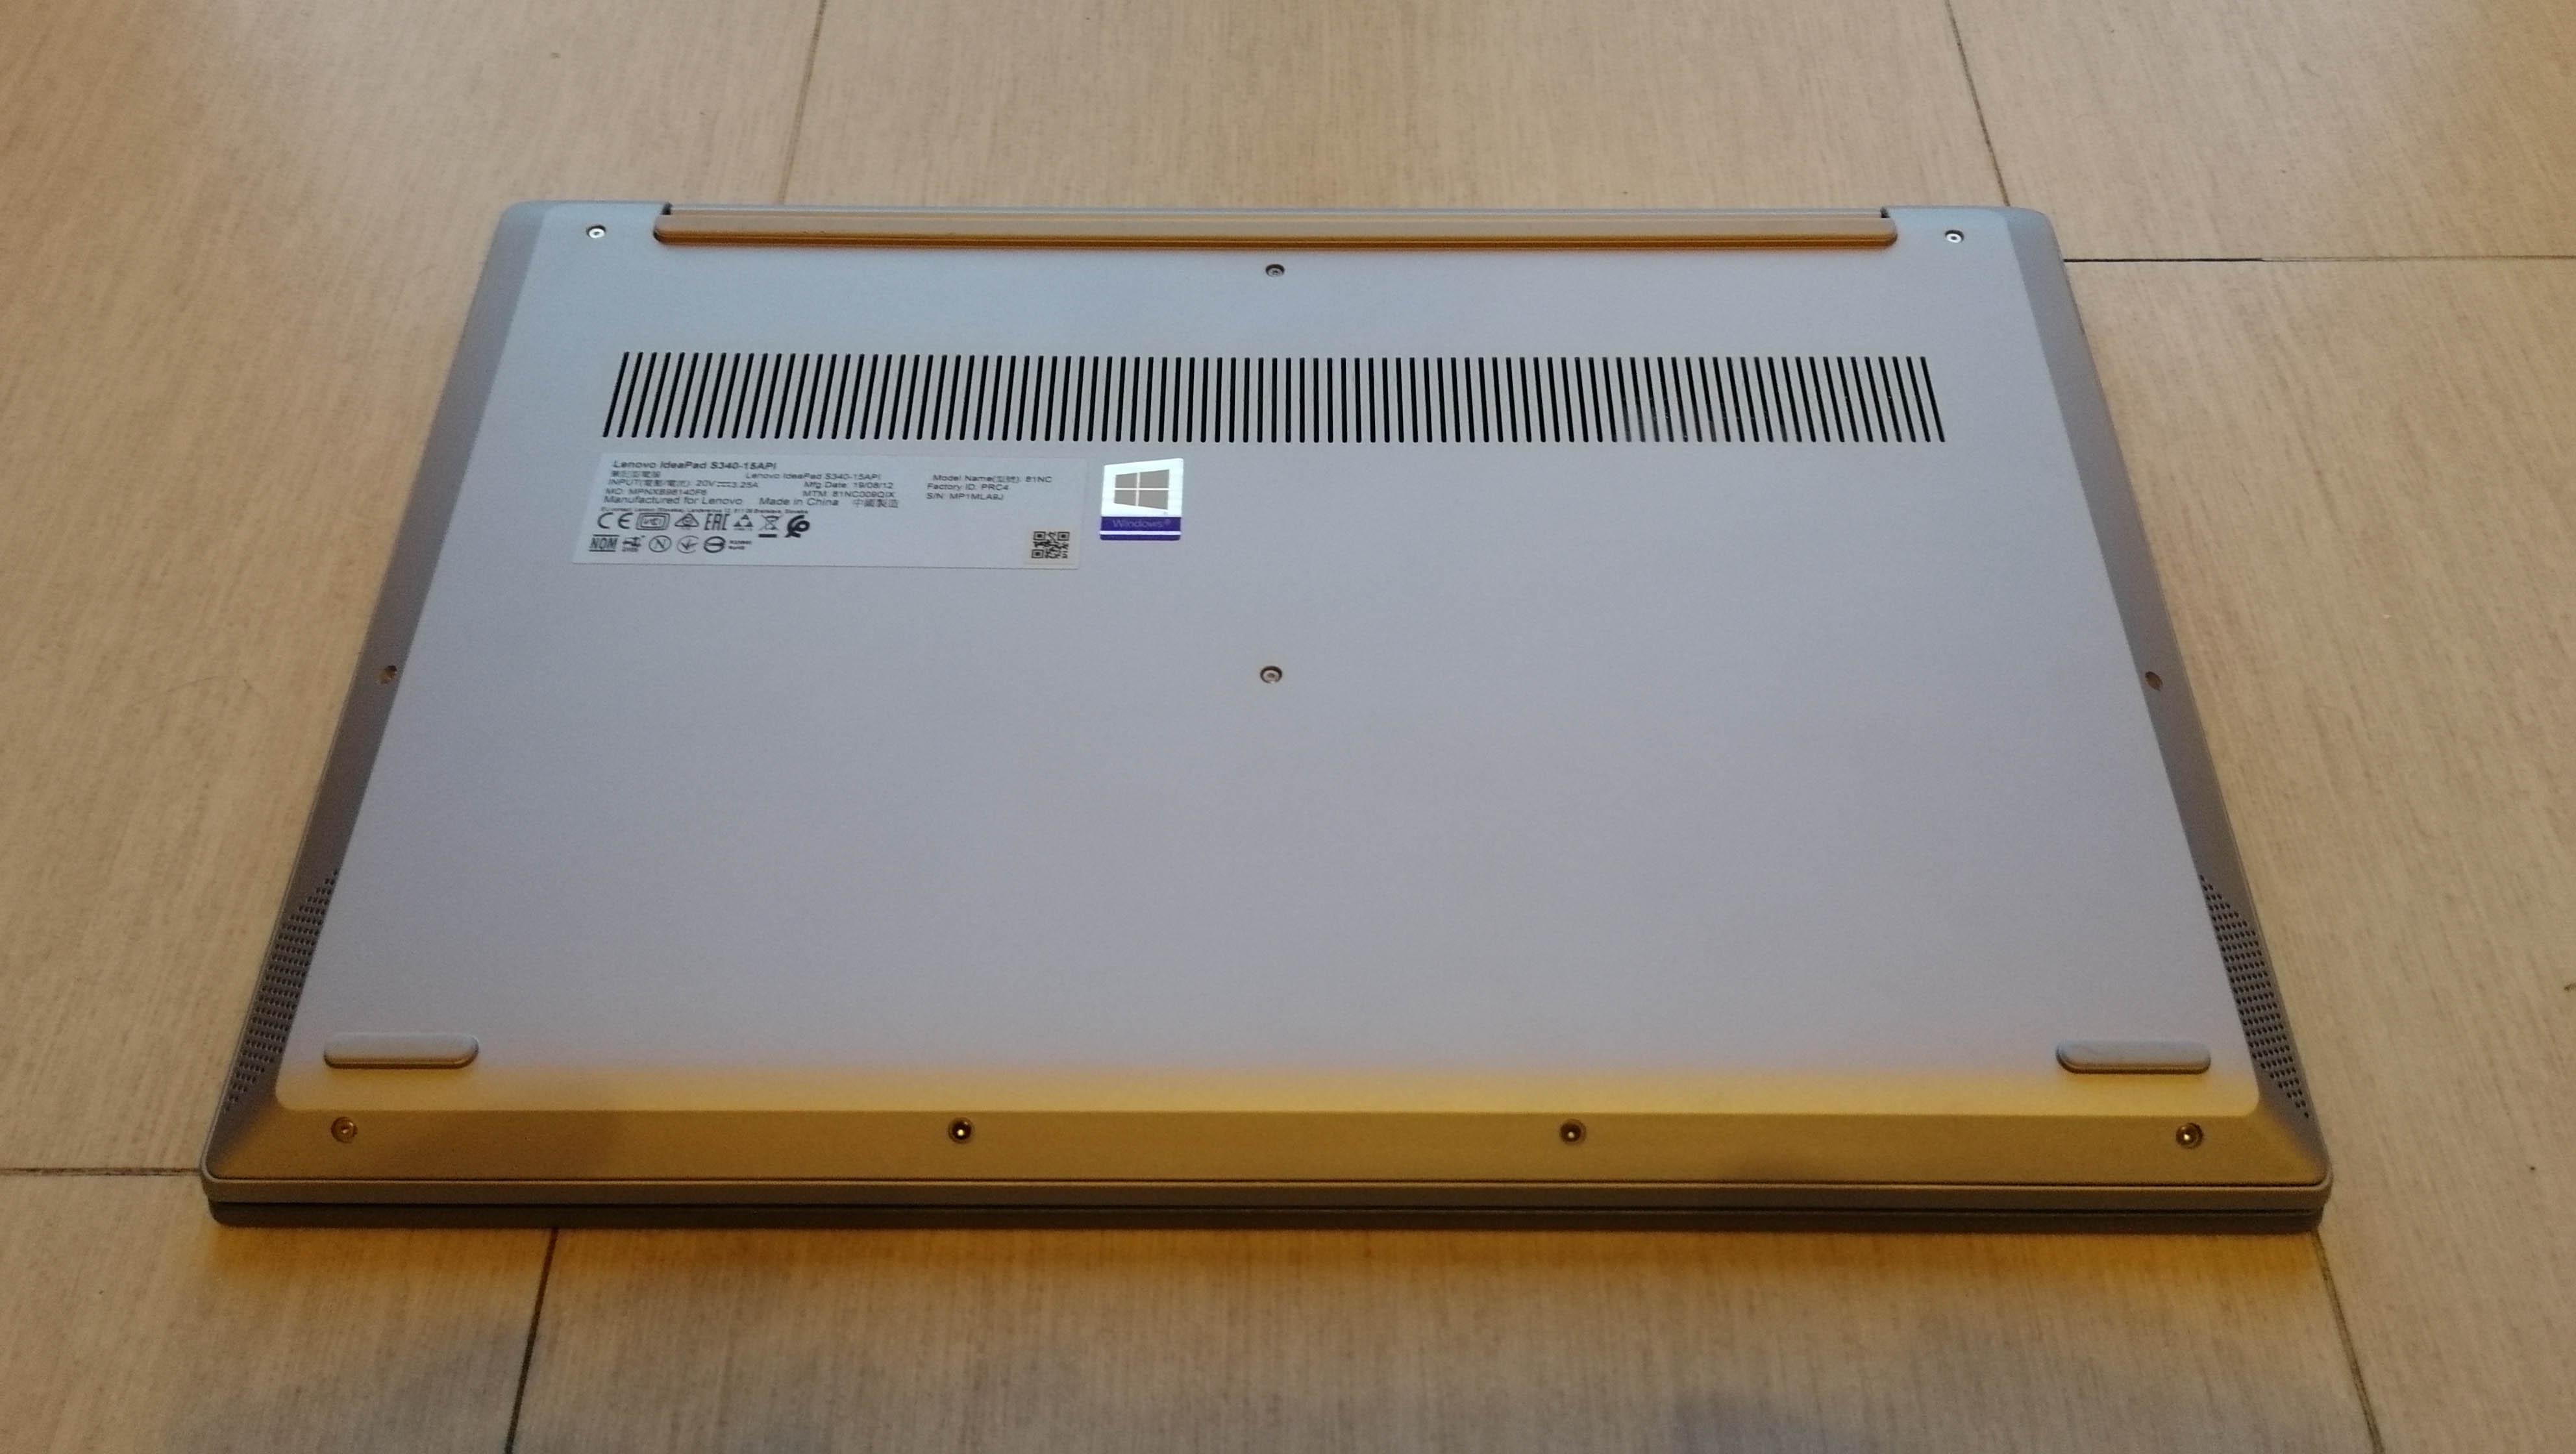 Lenovo IdeaPad S340 presa d'aria